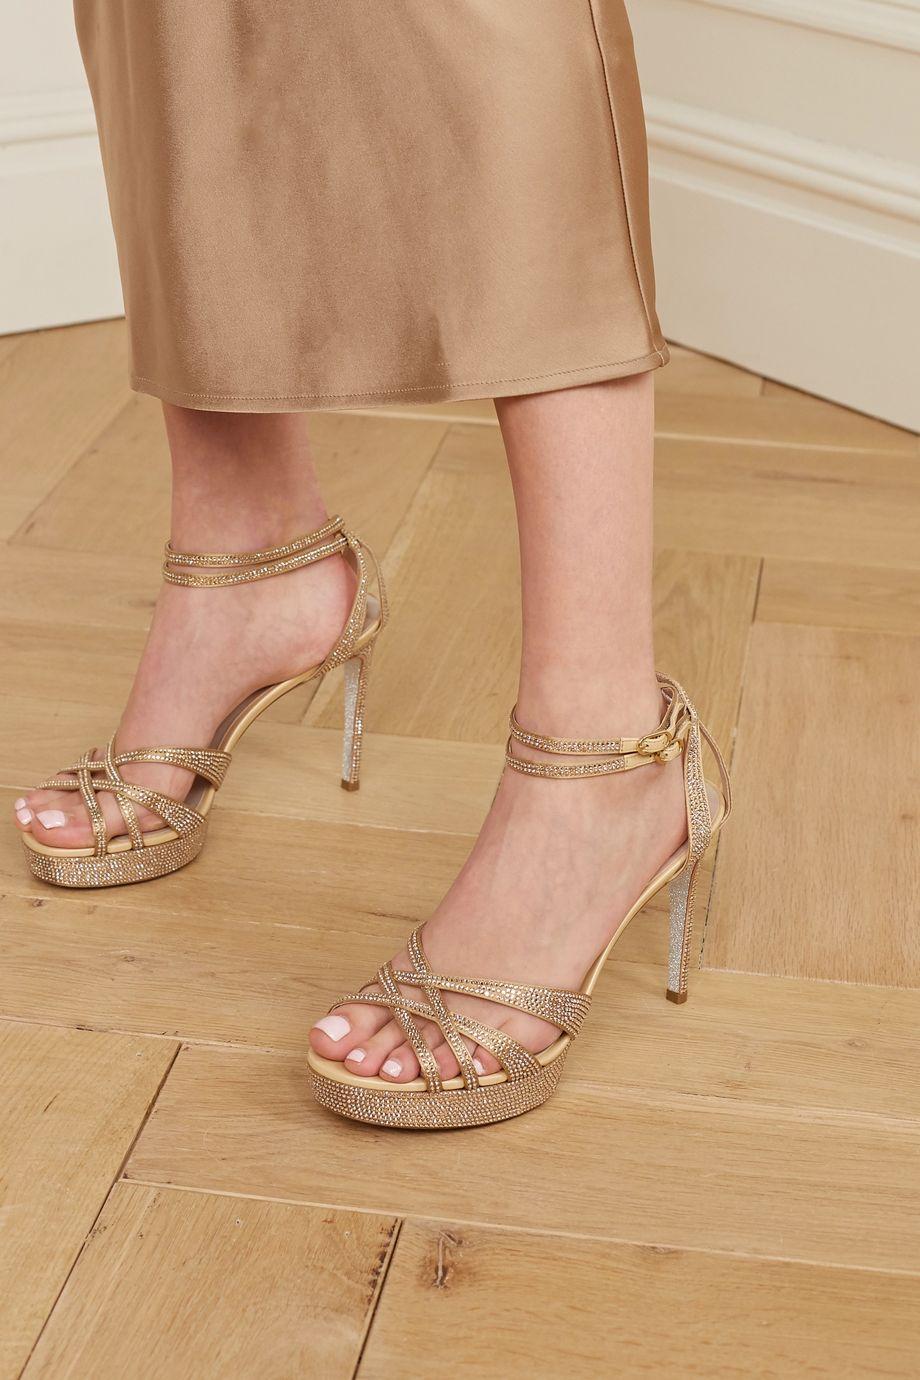 René Caovilla Dania crystal-embellished satin platform sandals